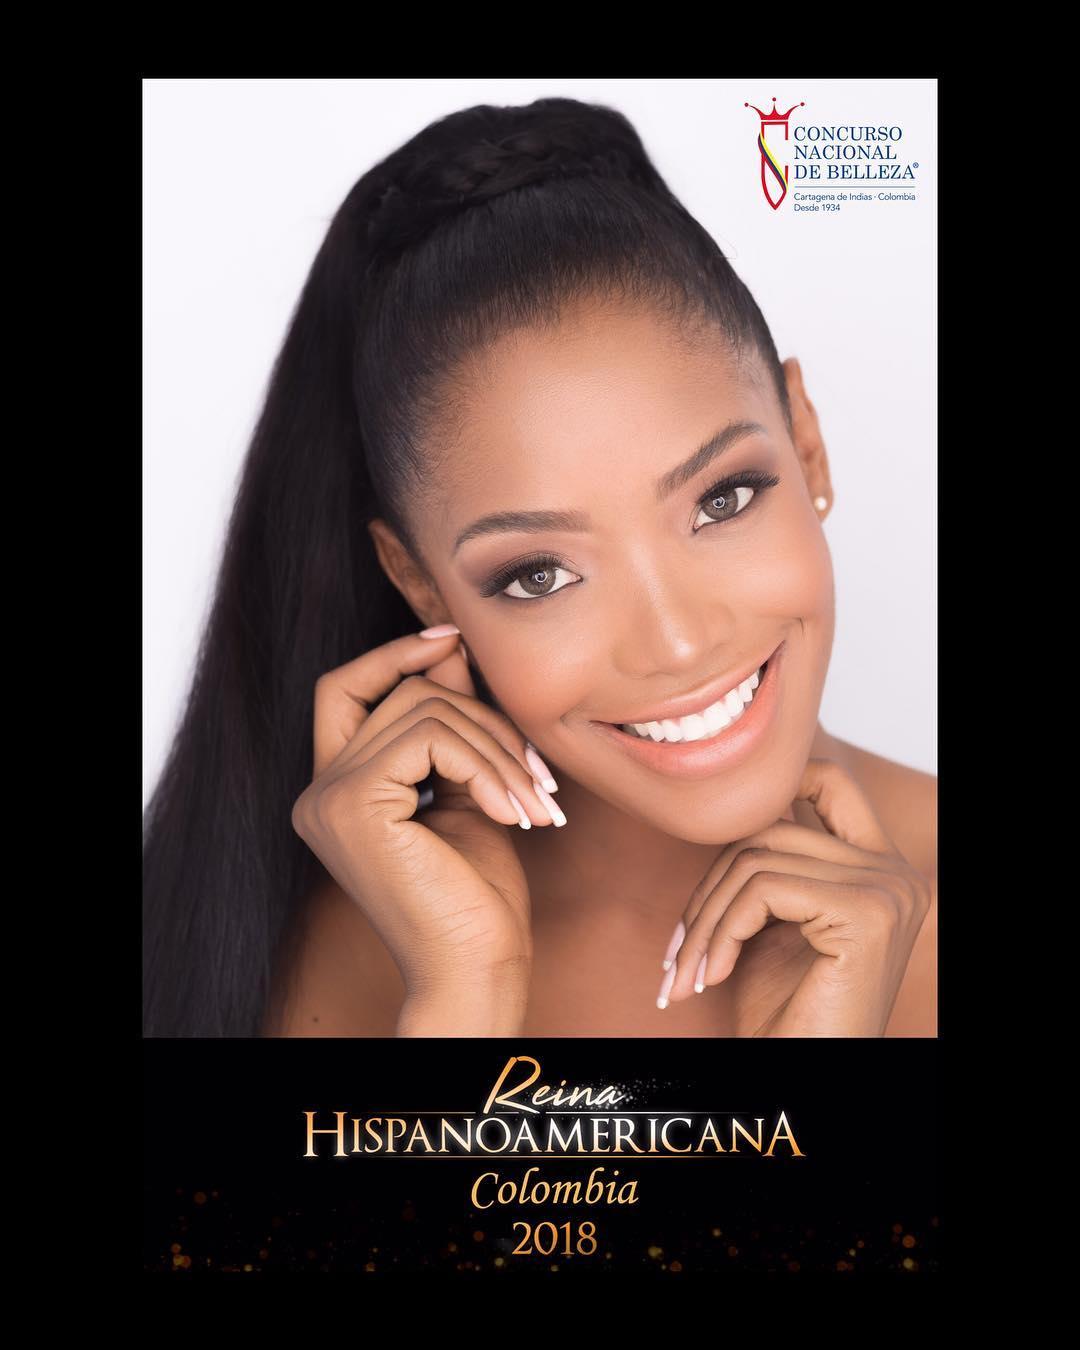 alma diaz, miss colombia hispanoamericana 2018. 42003113